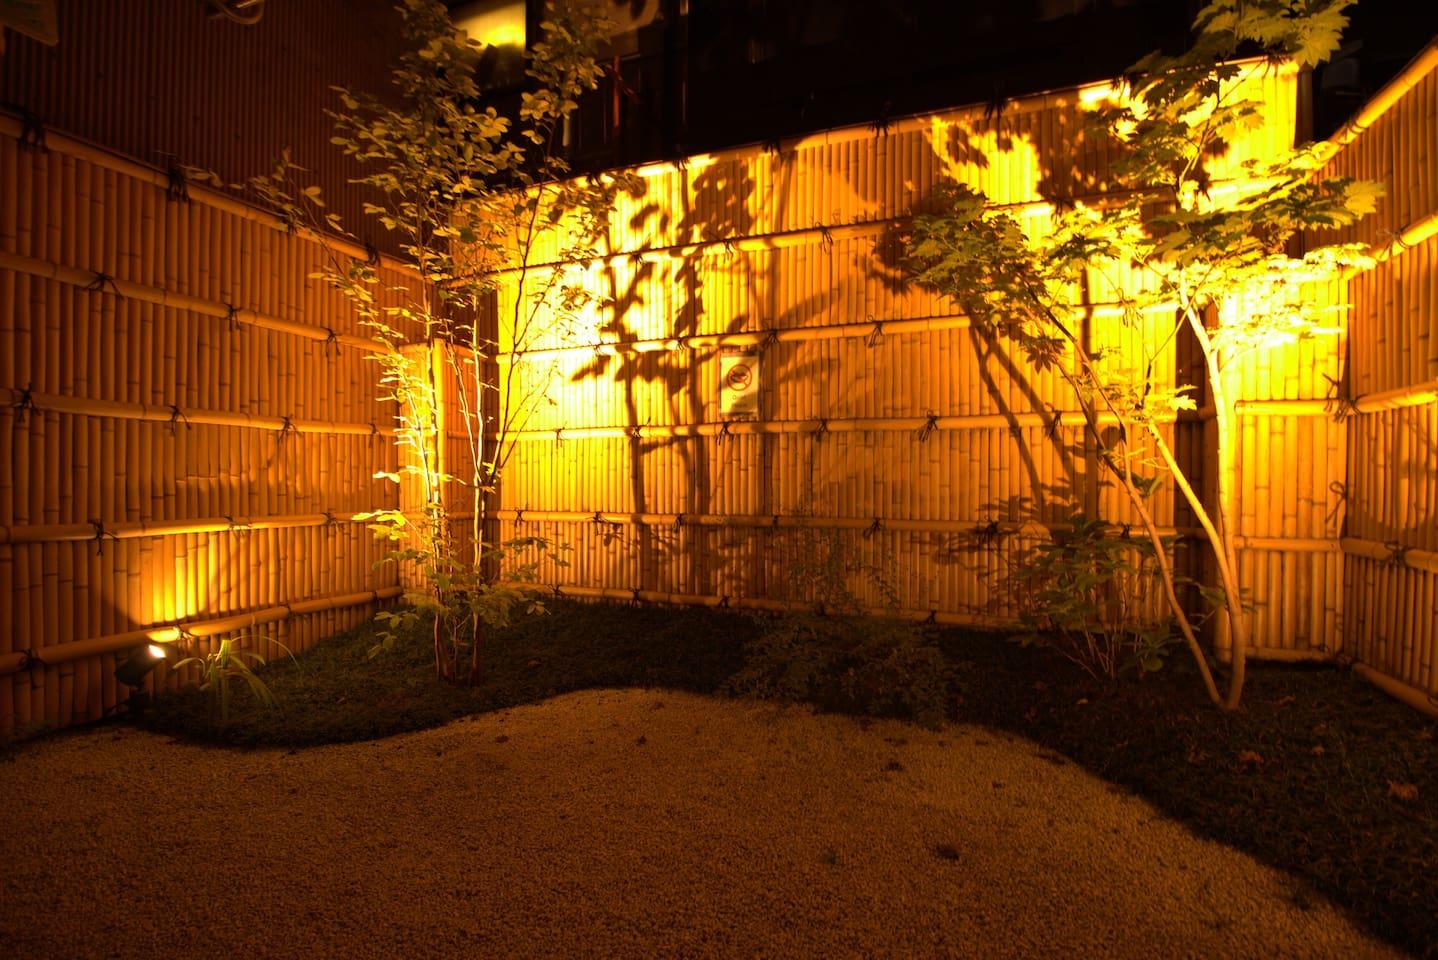 The garden is light up at night 夜には庭がライトアップされます